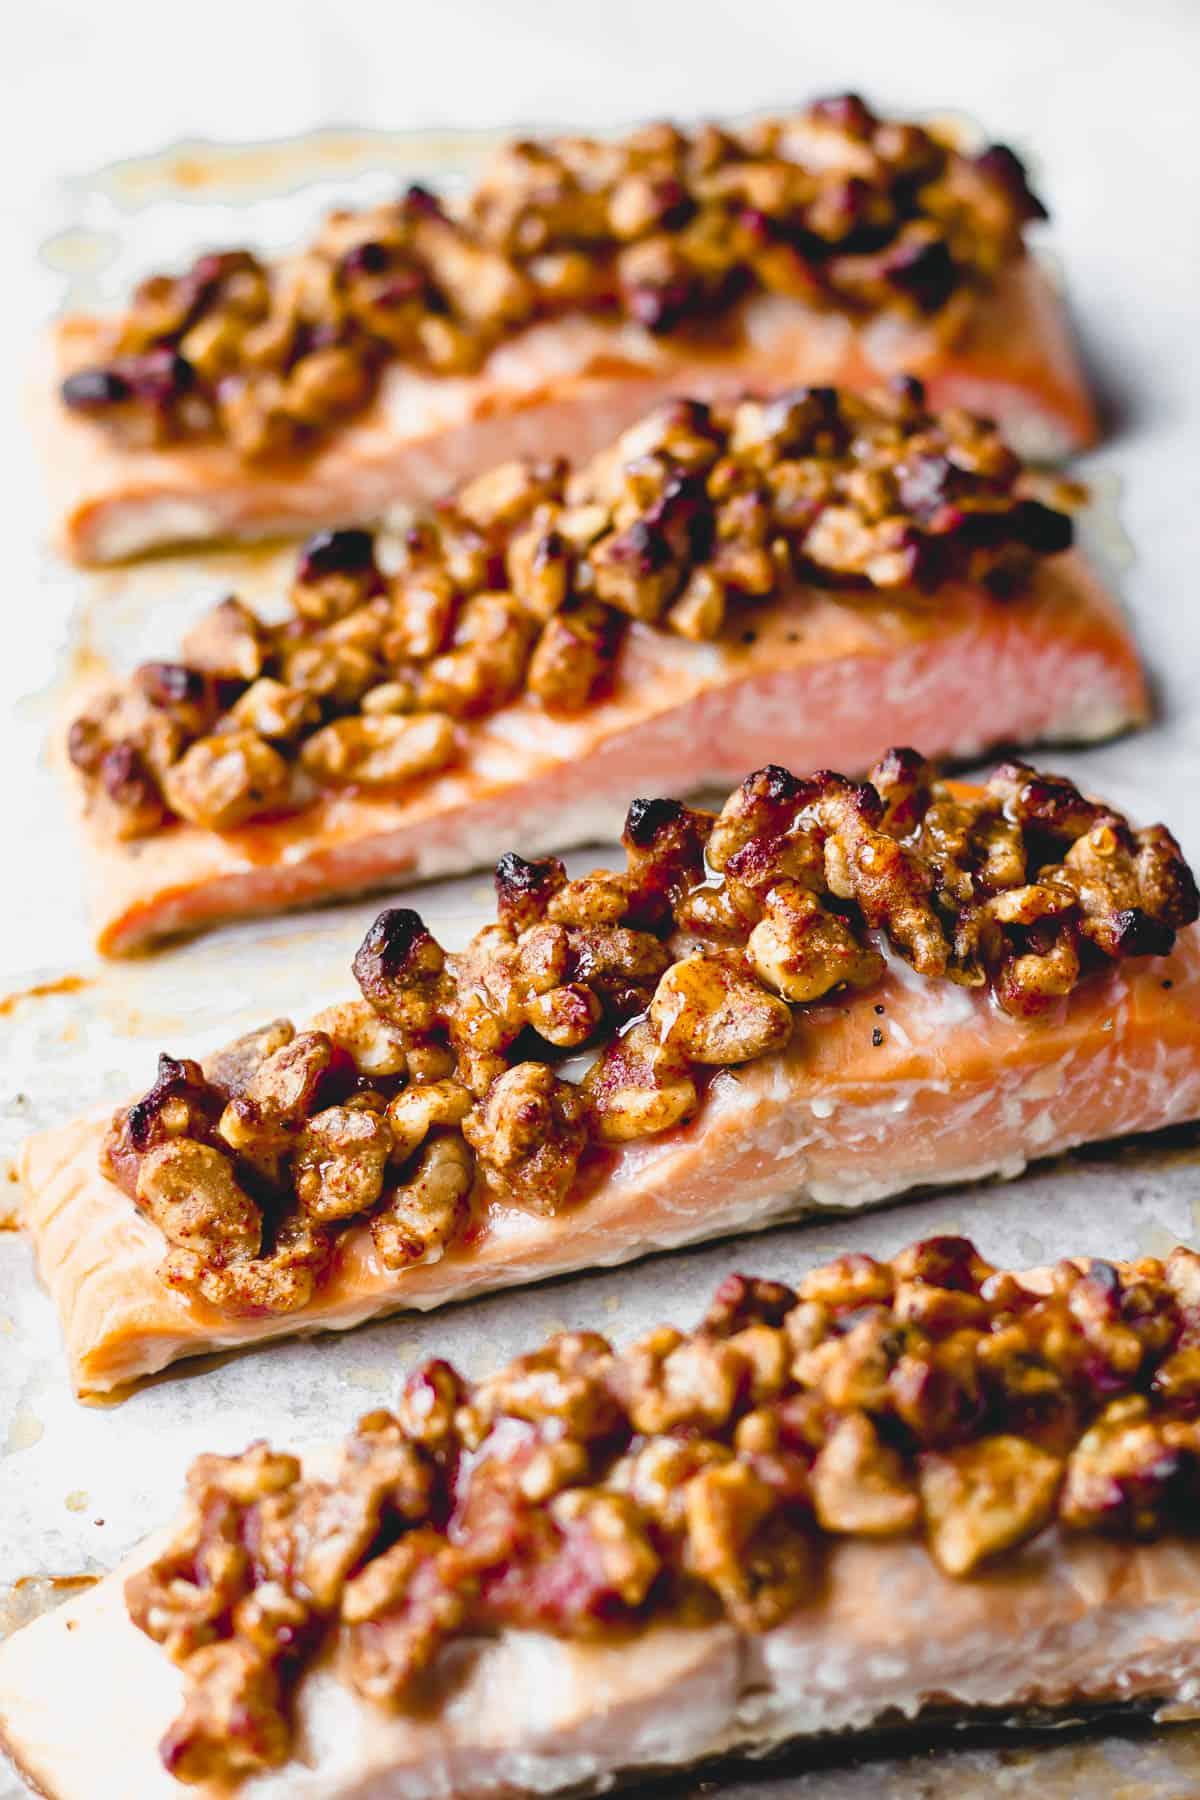 4 Roasted maple walnut salmon fillets